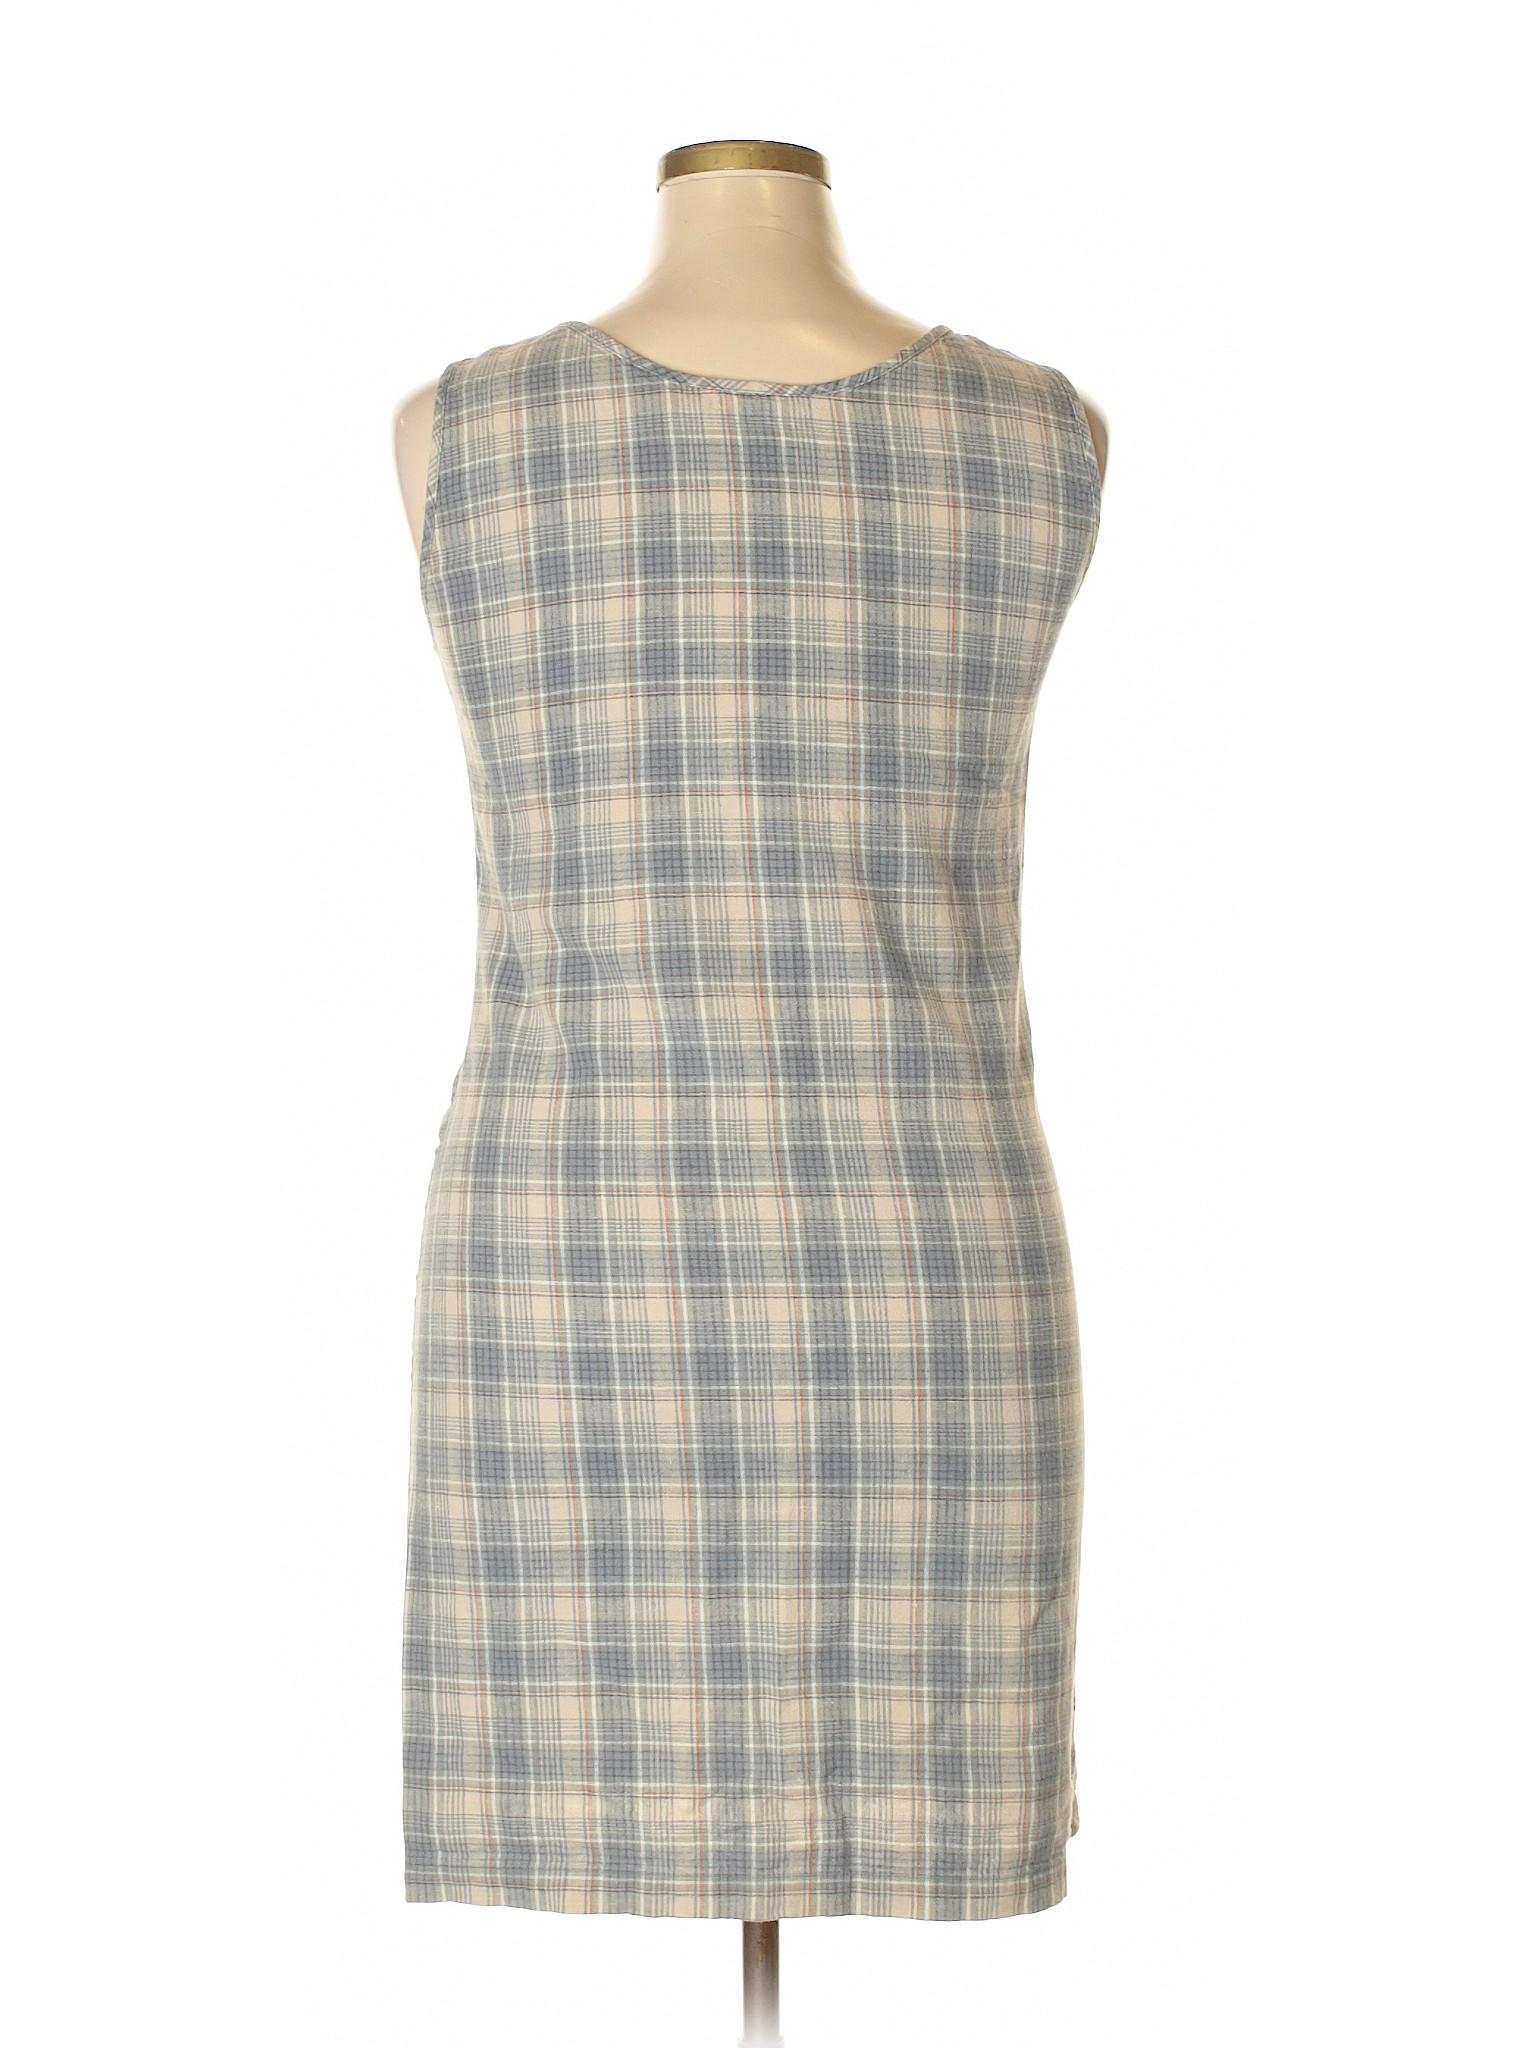 L Bean Boutique Dress L winter Casual YTqFRx